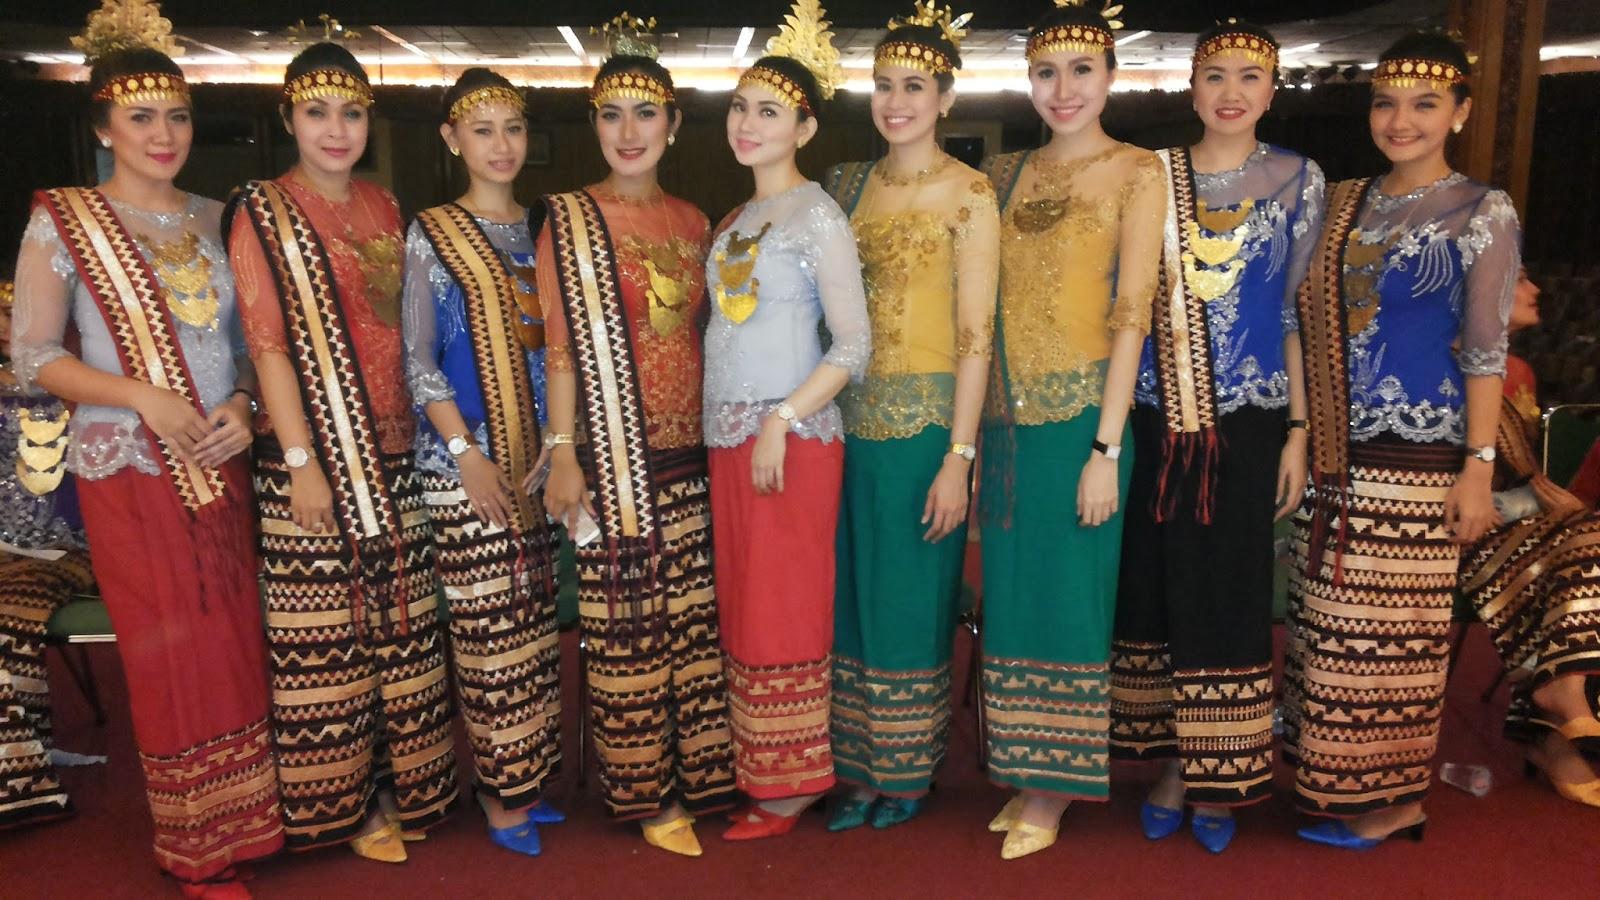 image Indonesia anak sma sewa lonte